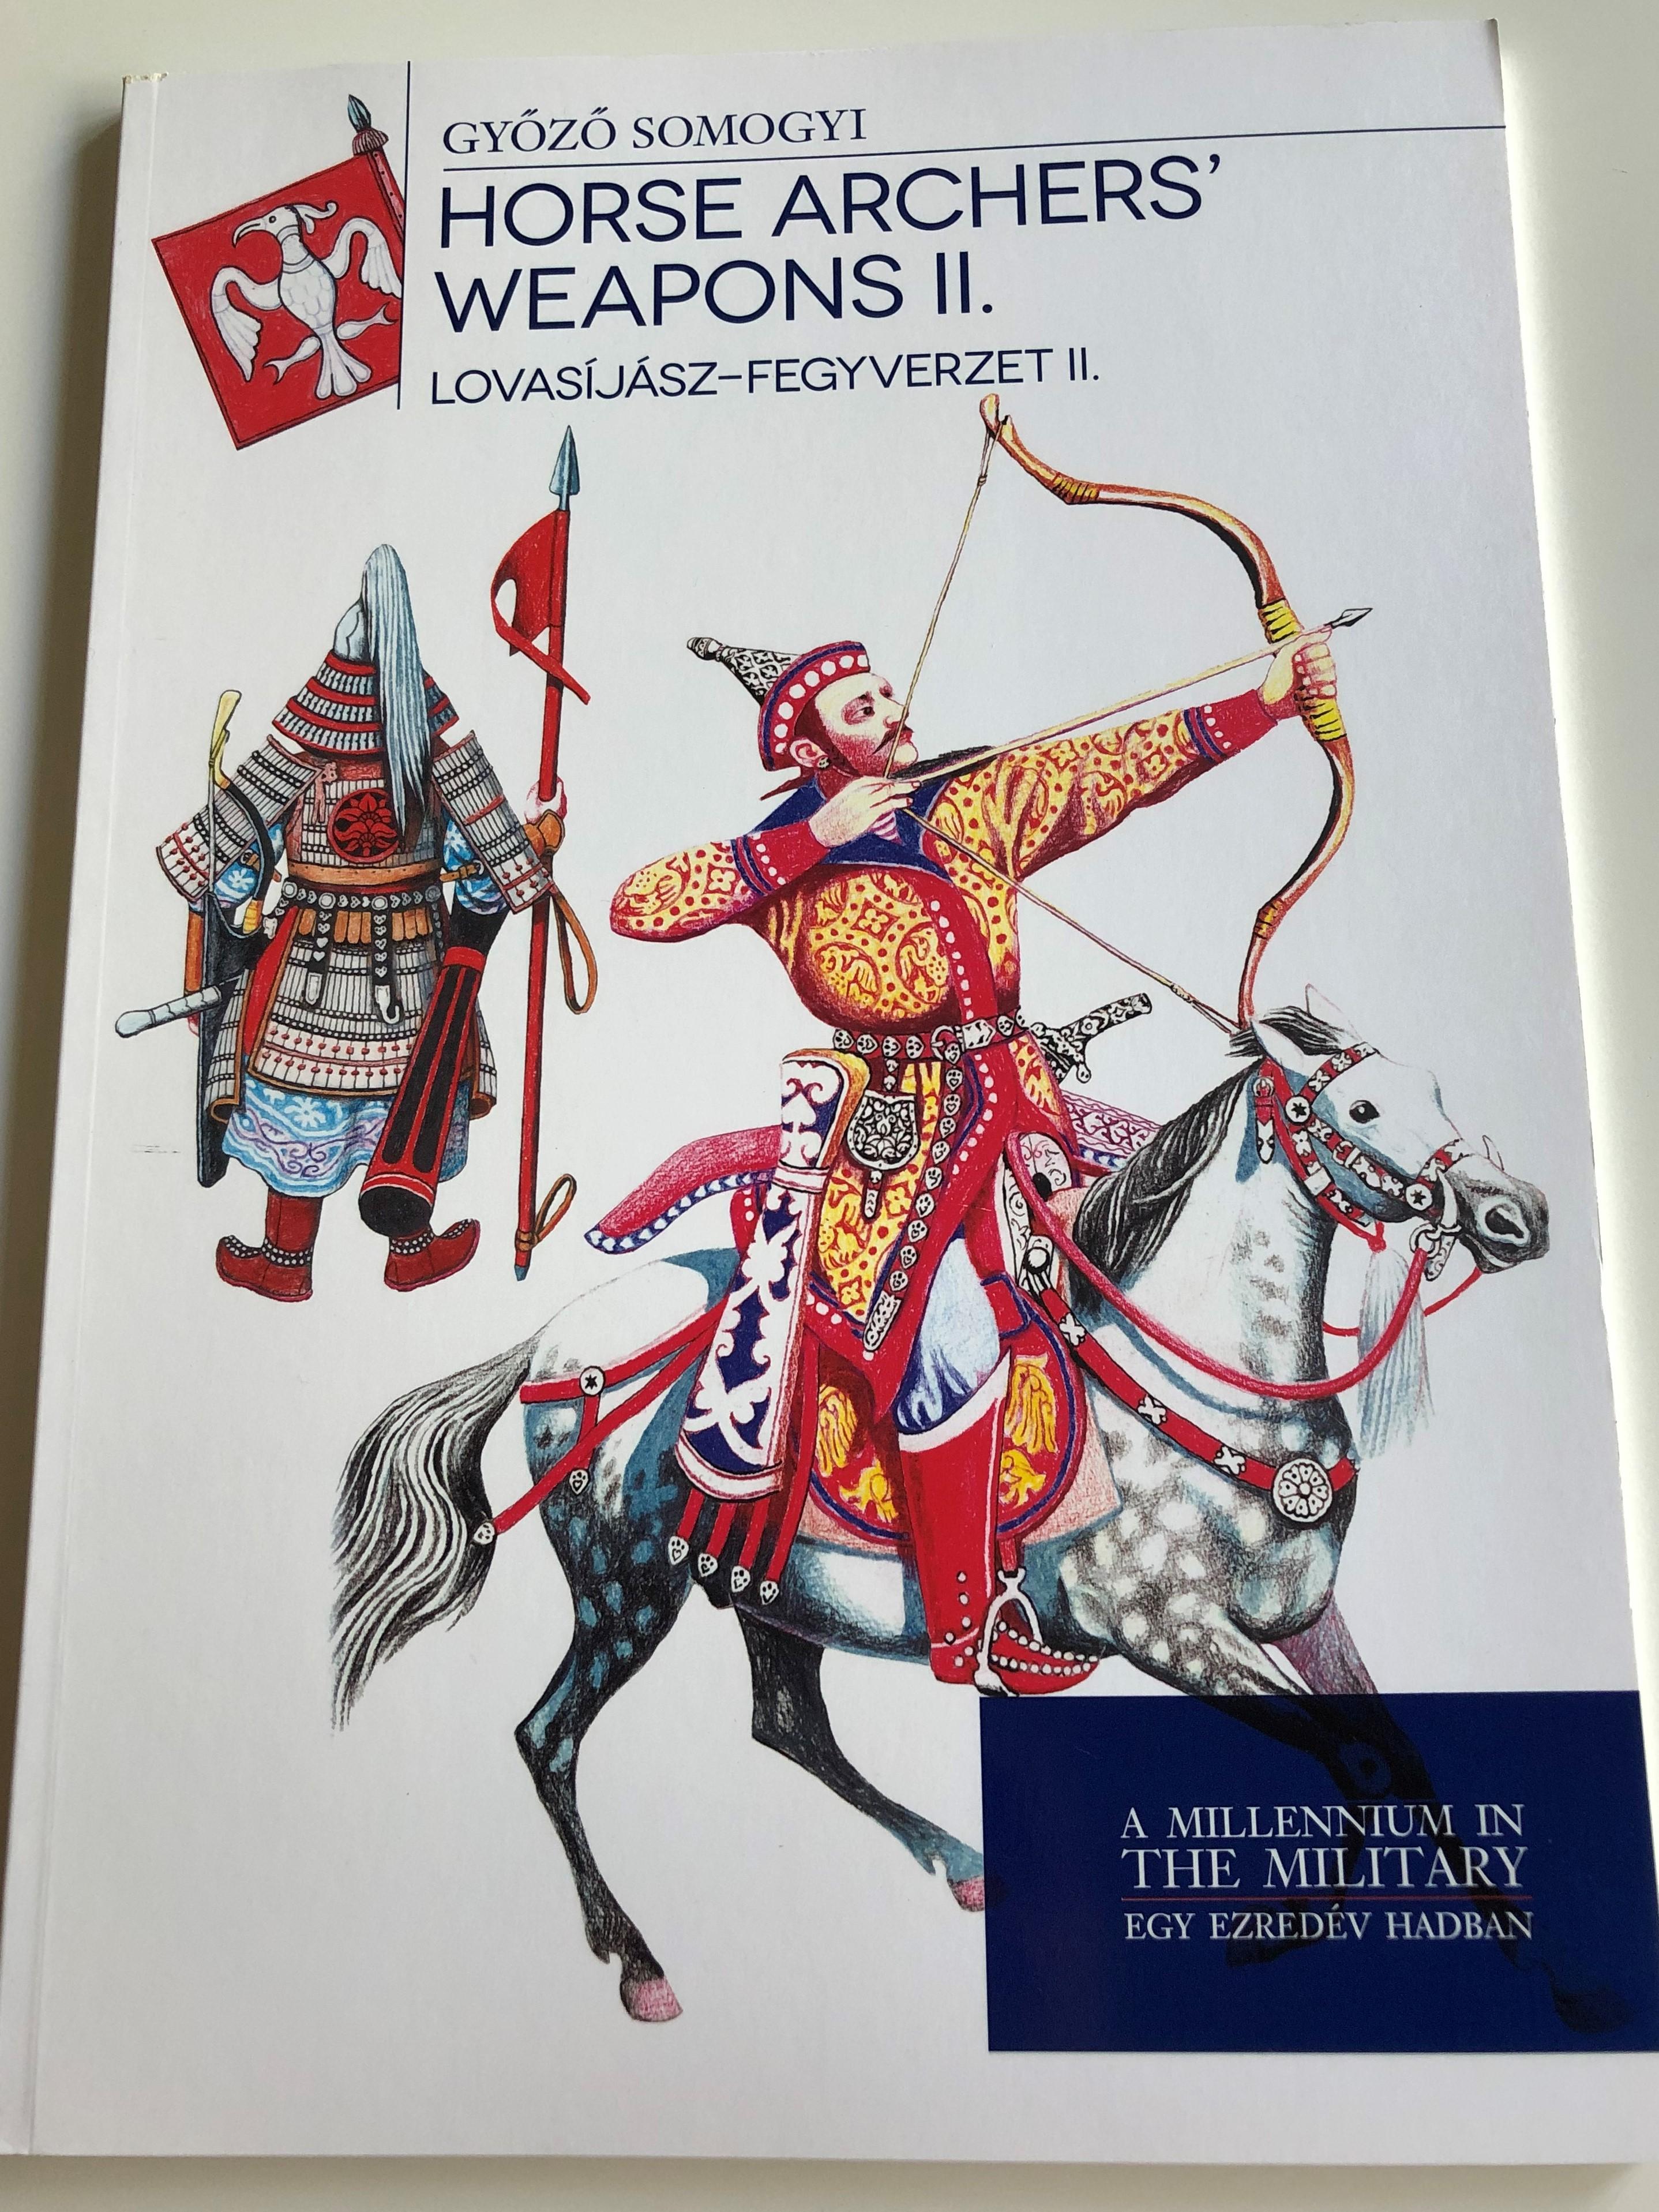 horse-archers-weapons-ii.-by-gy-z-somogyi-lovas-j-sz-fegyverzet-ii.-a-millenium-in-the-military-egy-ezred-v-hadban-paperback-2016-hm-zr-nyi-1-.jpg